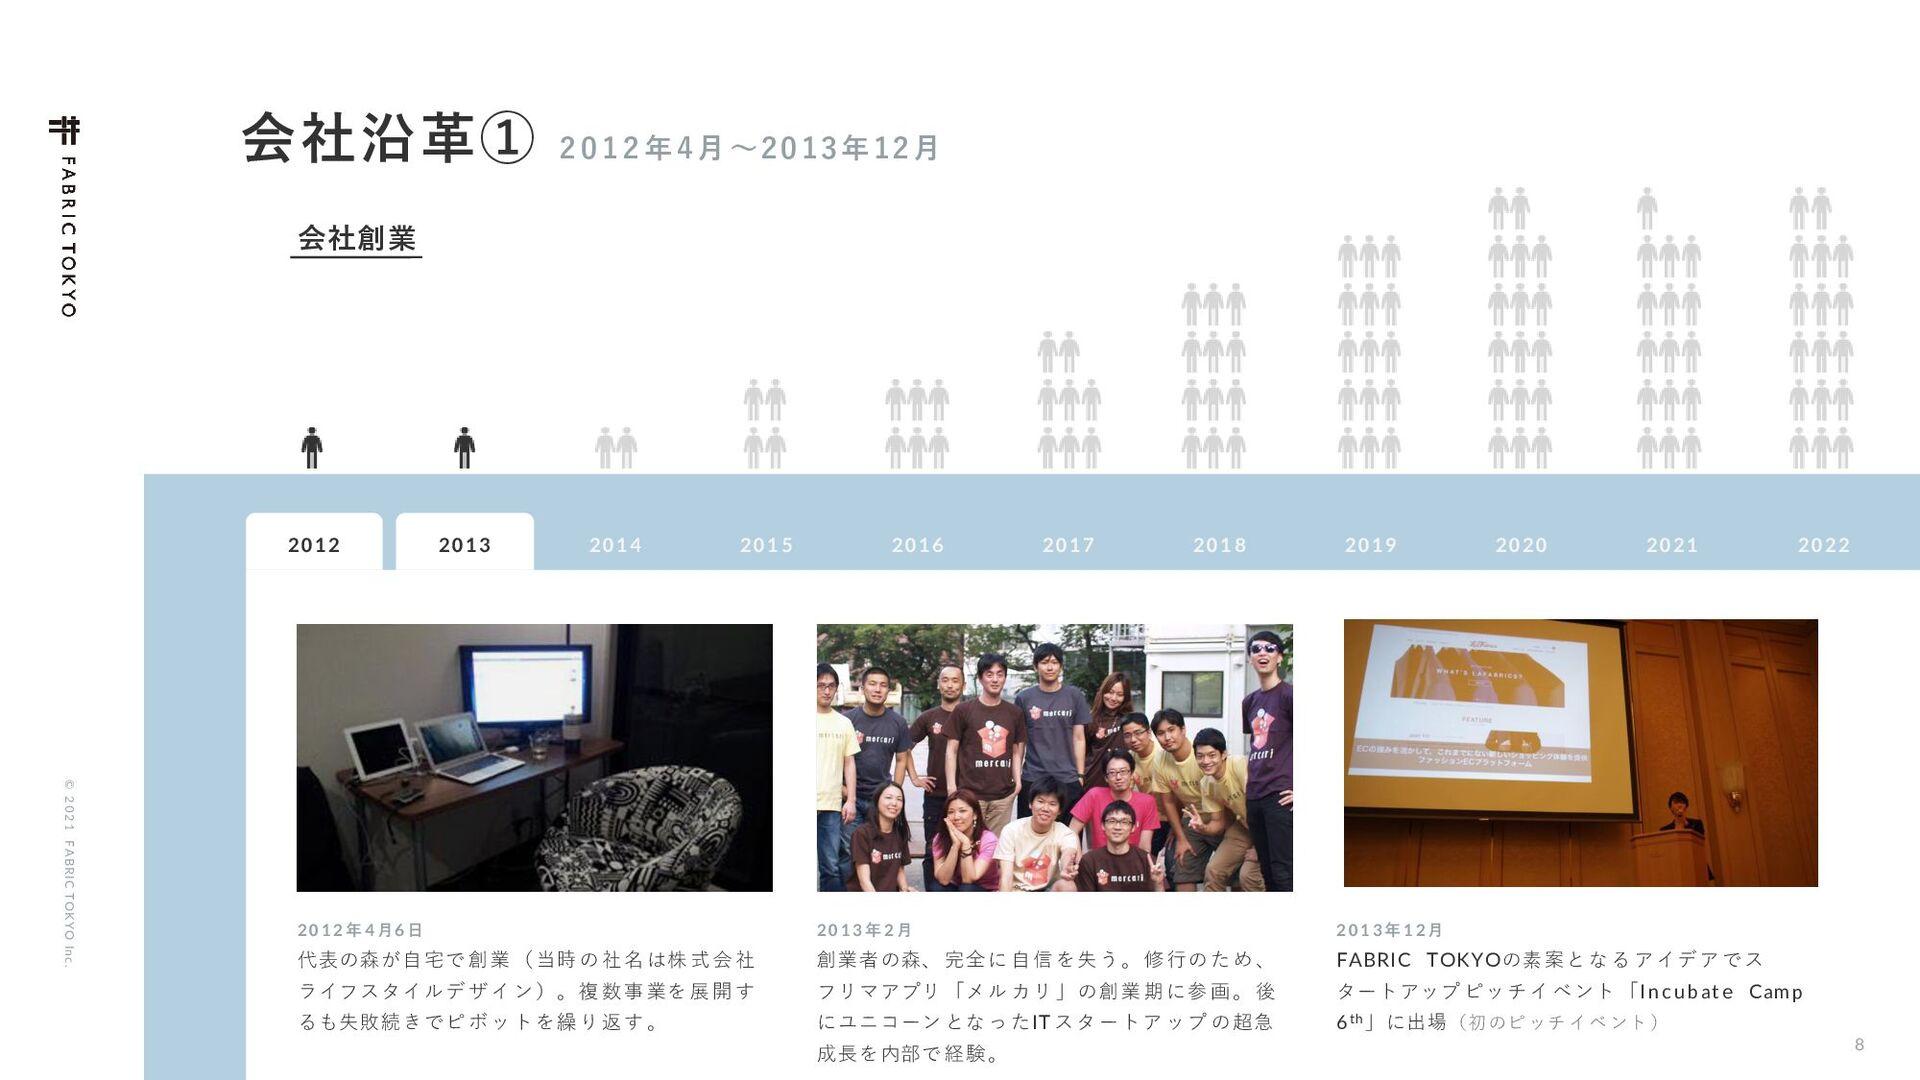 © 2021 FABRIC TOKYO Inc. 8 ձࣾԊֵᶅ ݄ʙ...